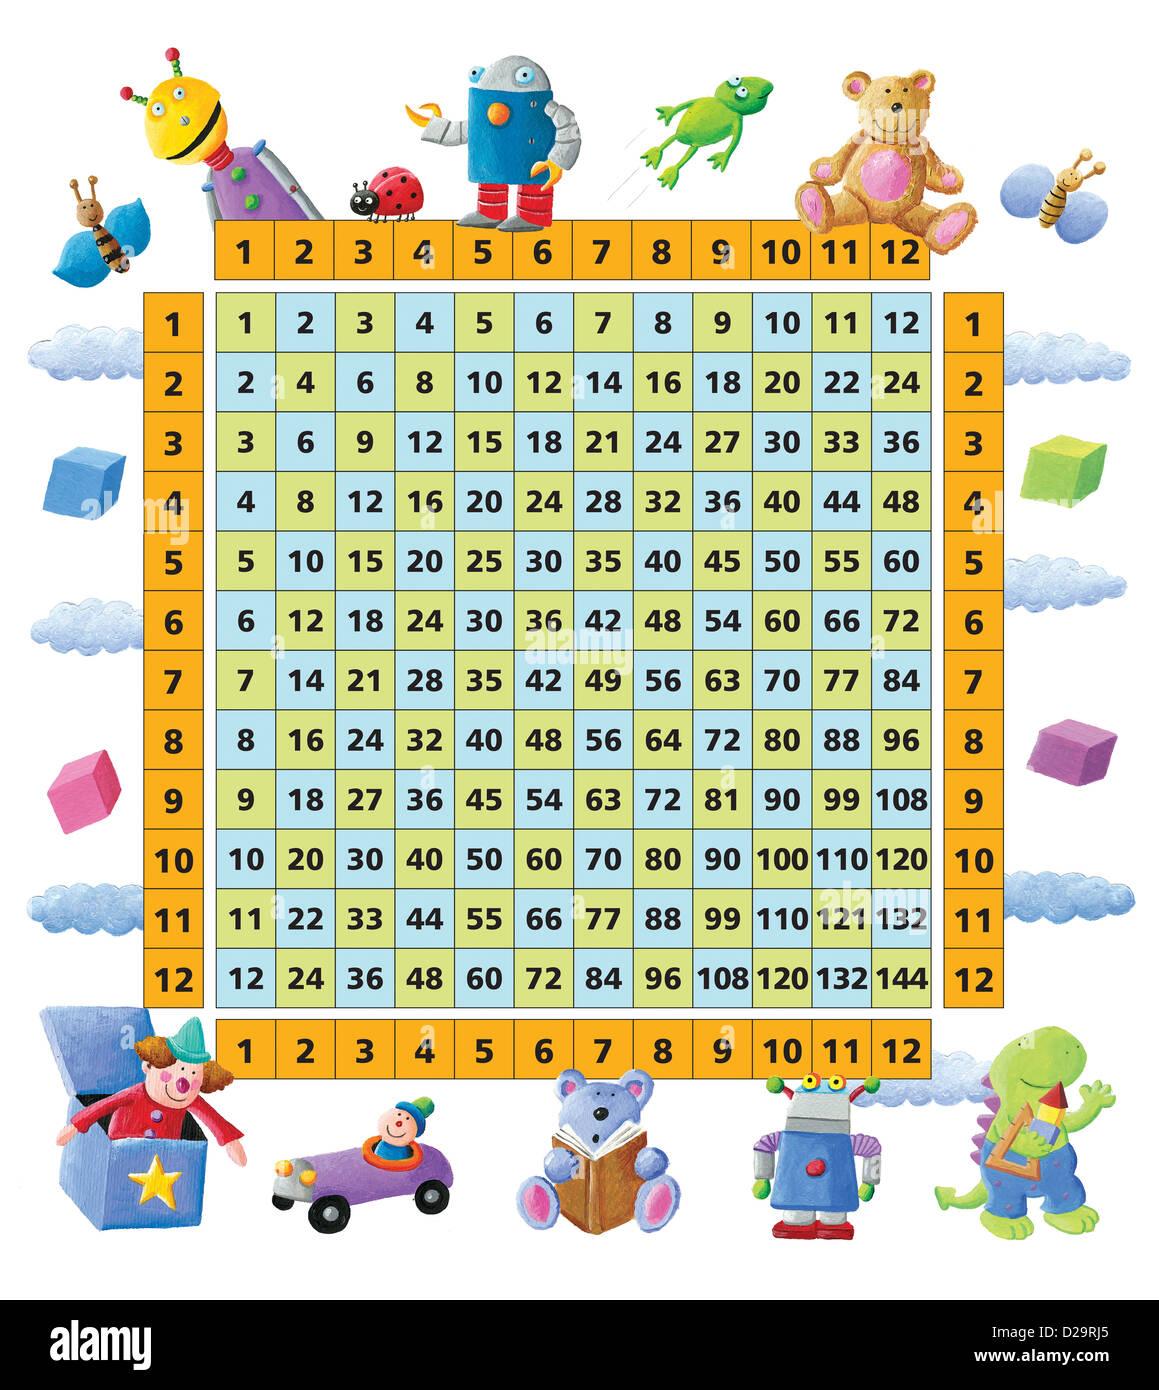 Funny Multiplication Table Stockfotos & Funny Multiplication Table ...